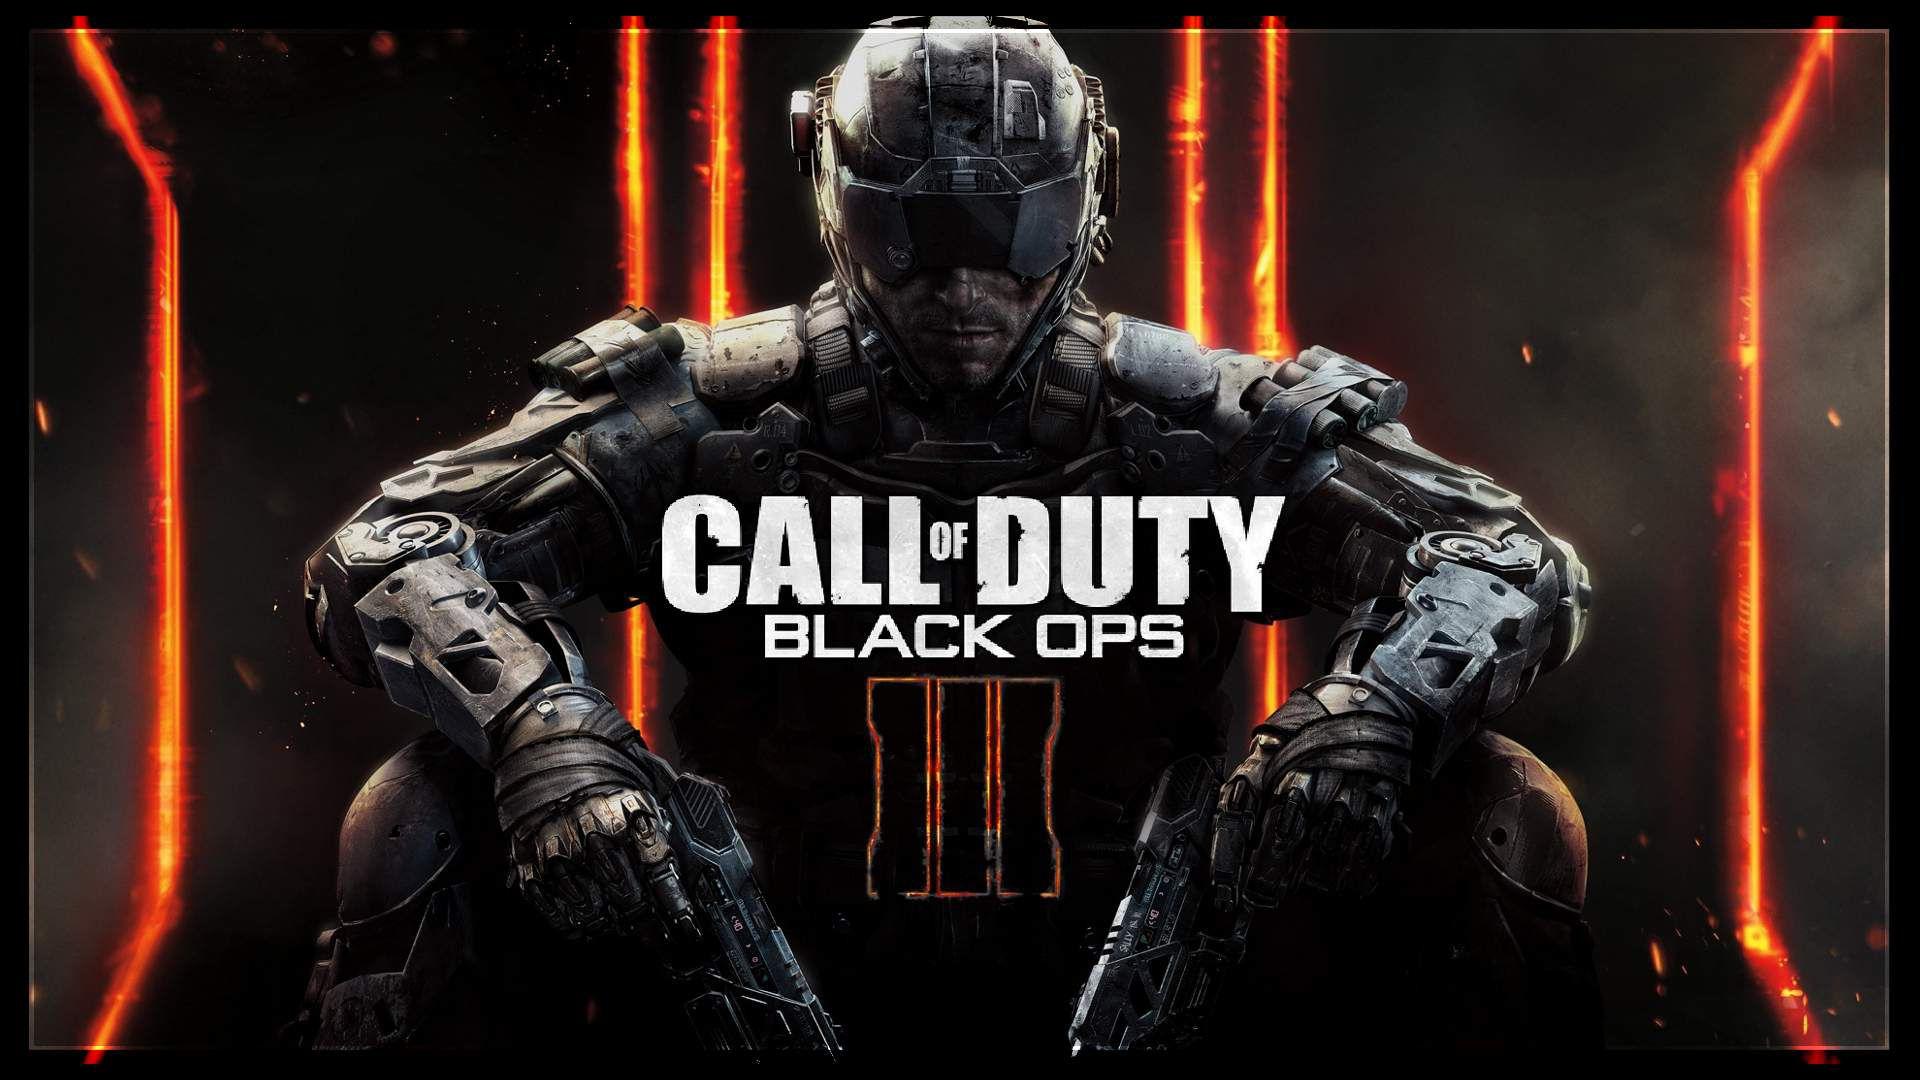 Black Ops 3 Soldier